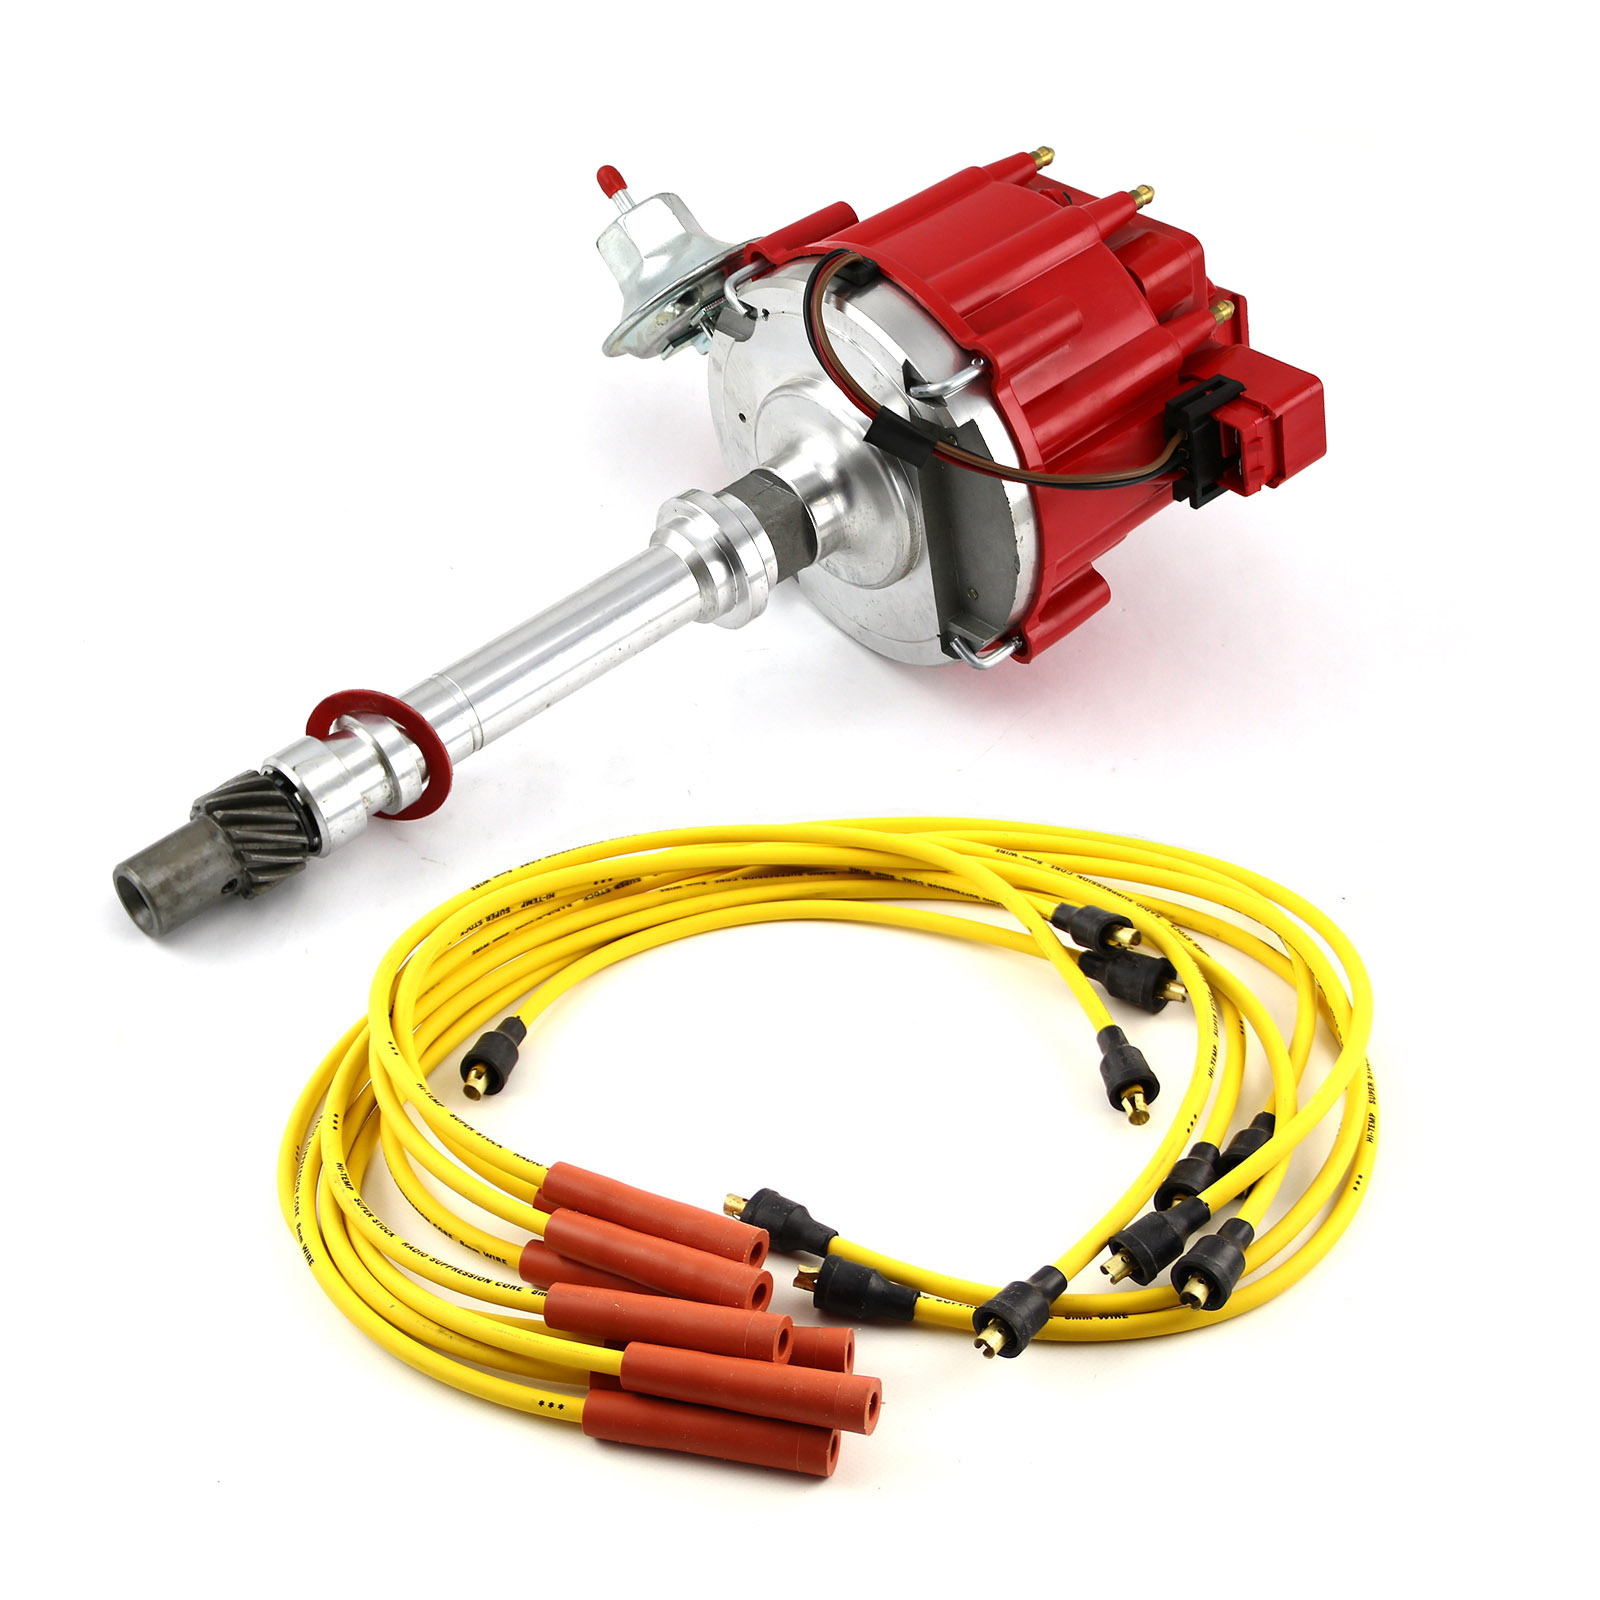 SSS385.1036?w=1000 chevy 454 spark plug wire diagram transmission wiring diagram 1997